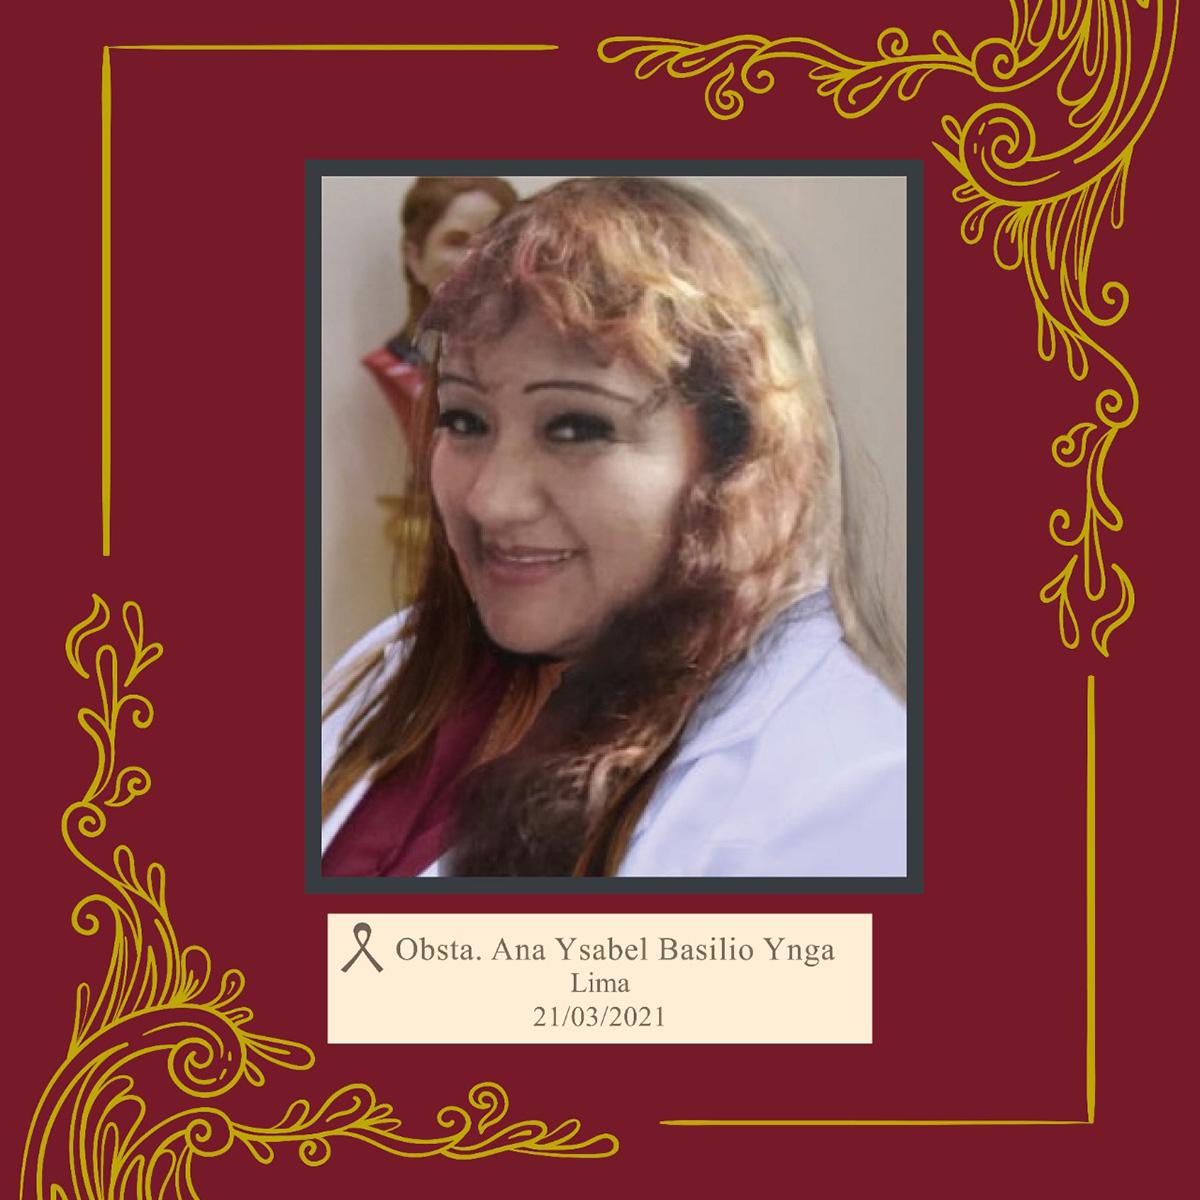 Ana Ysabel Basilio Ynga